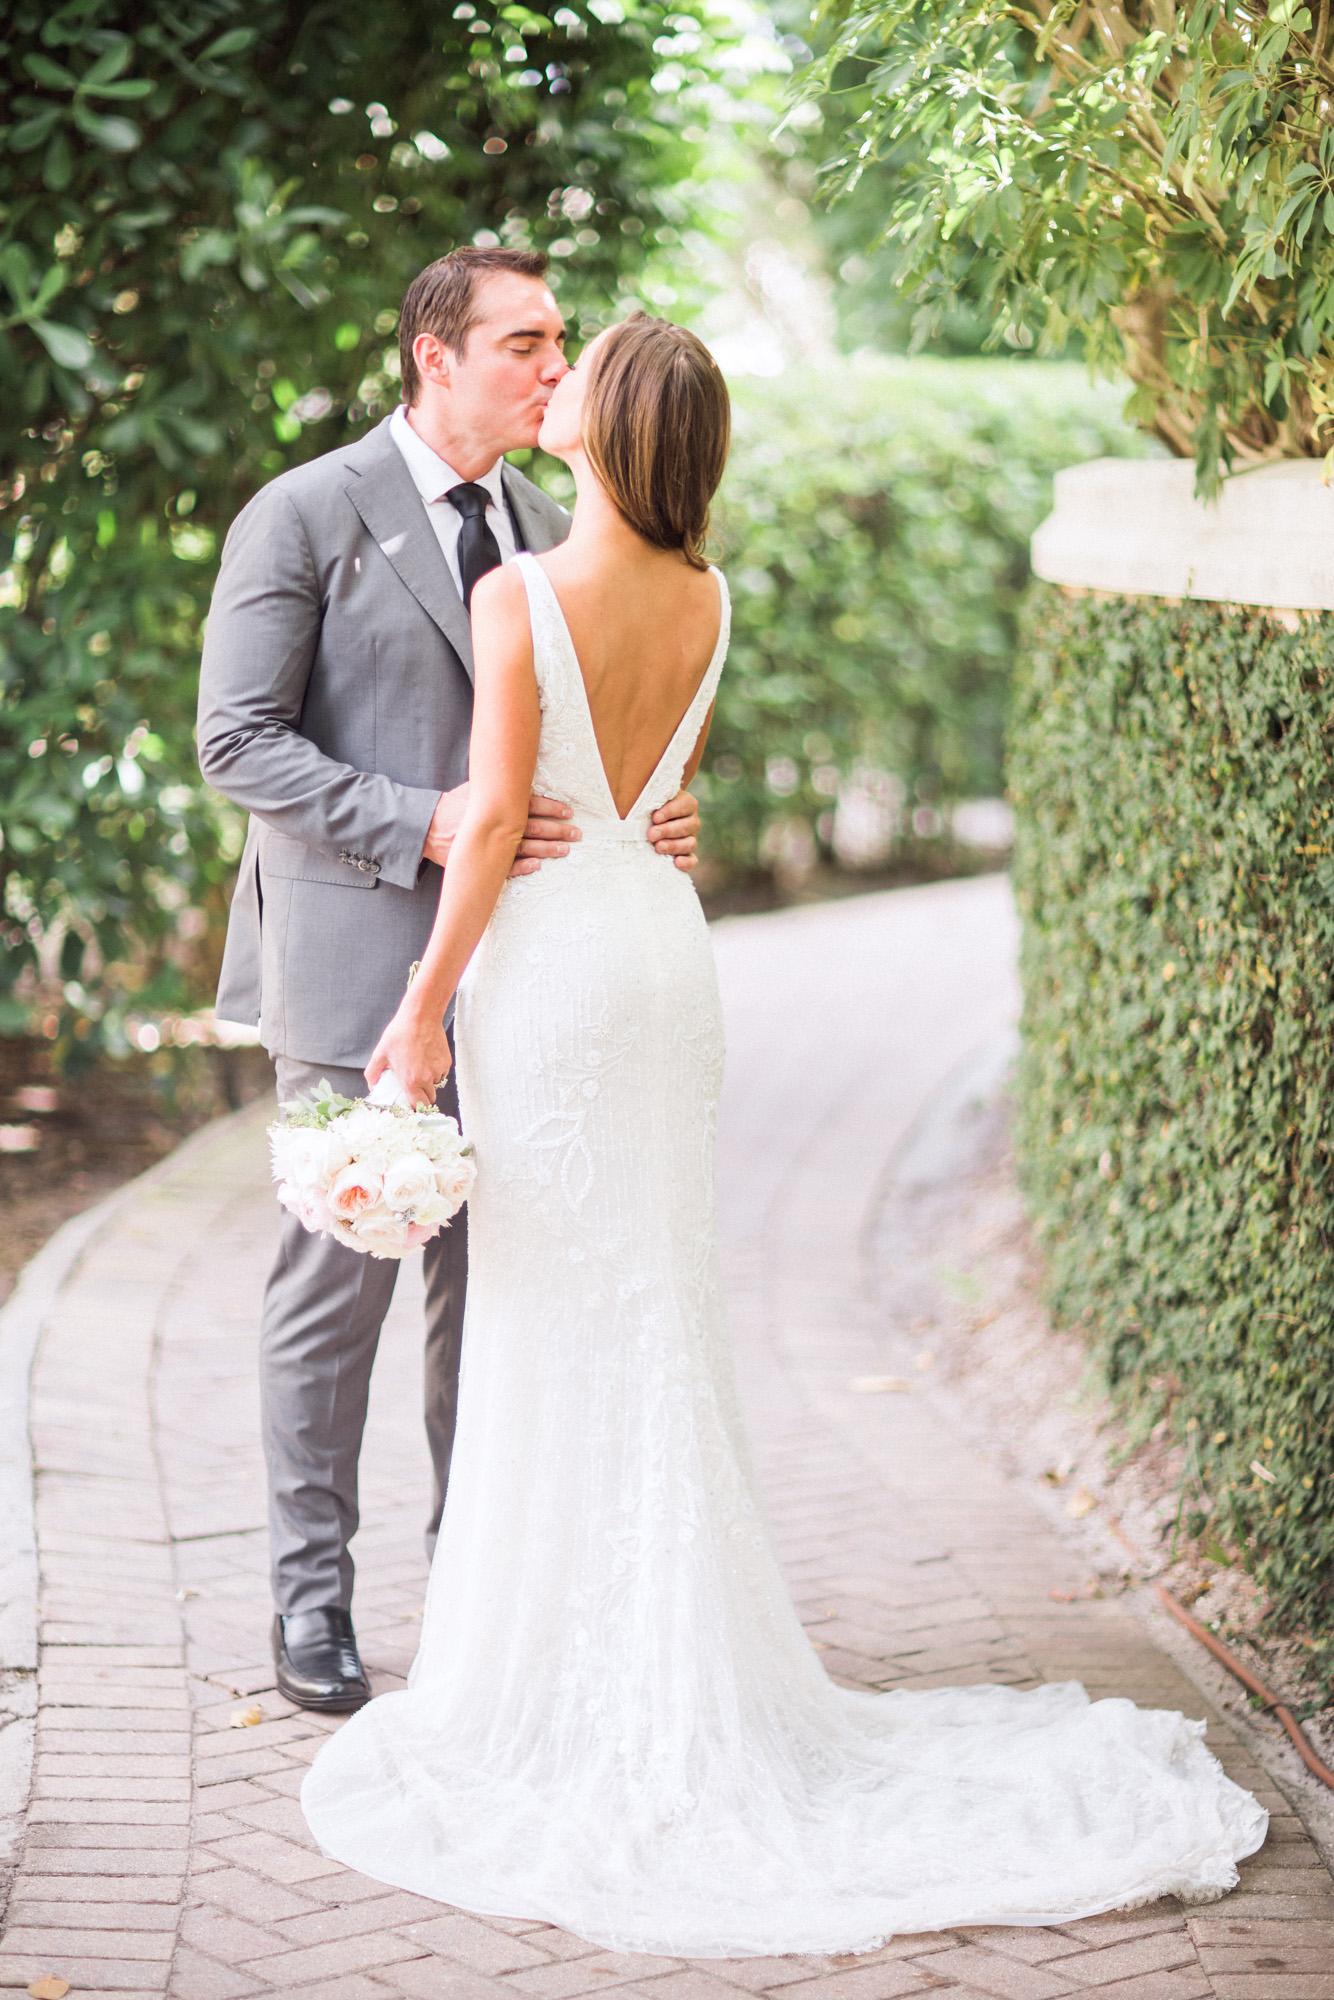 la-playa-naples-florida-destination-wedding-photographer-justine-steve-09787.jpg